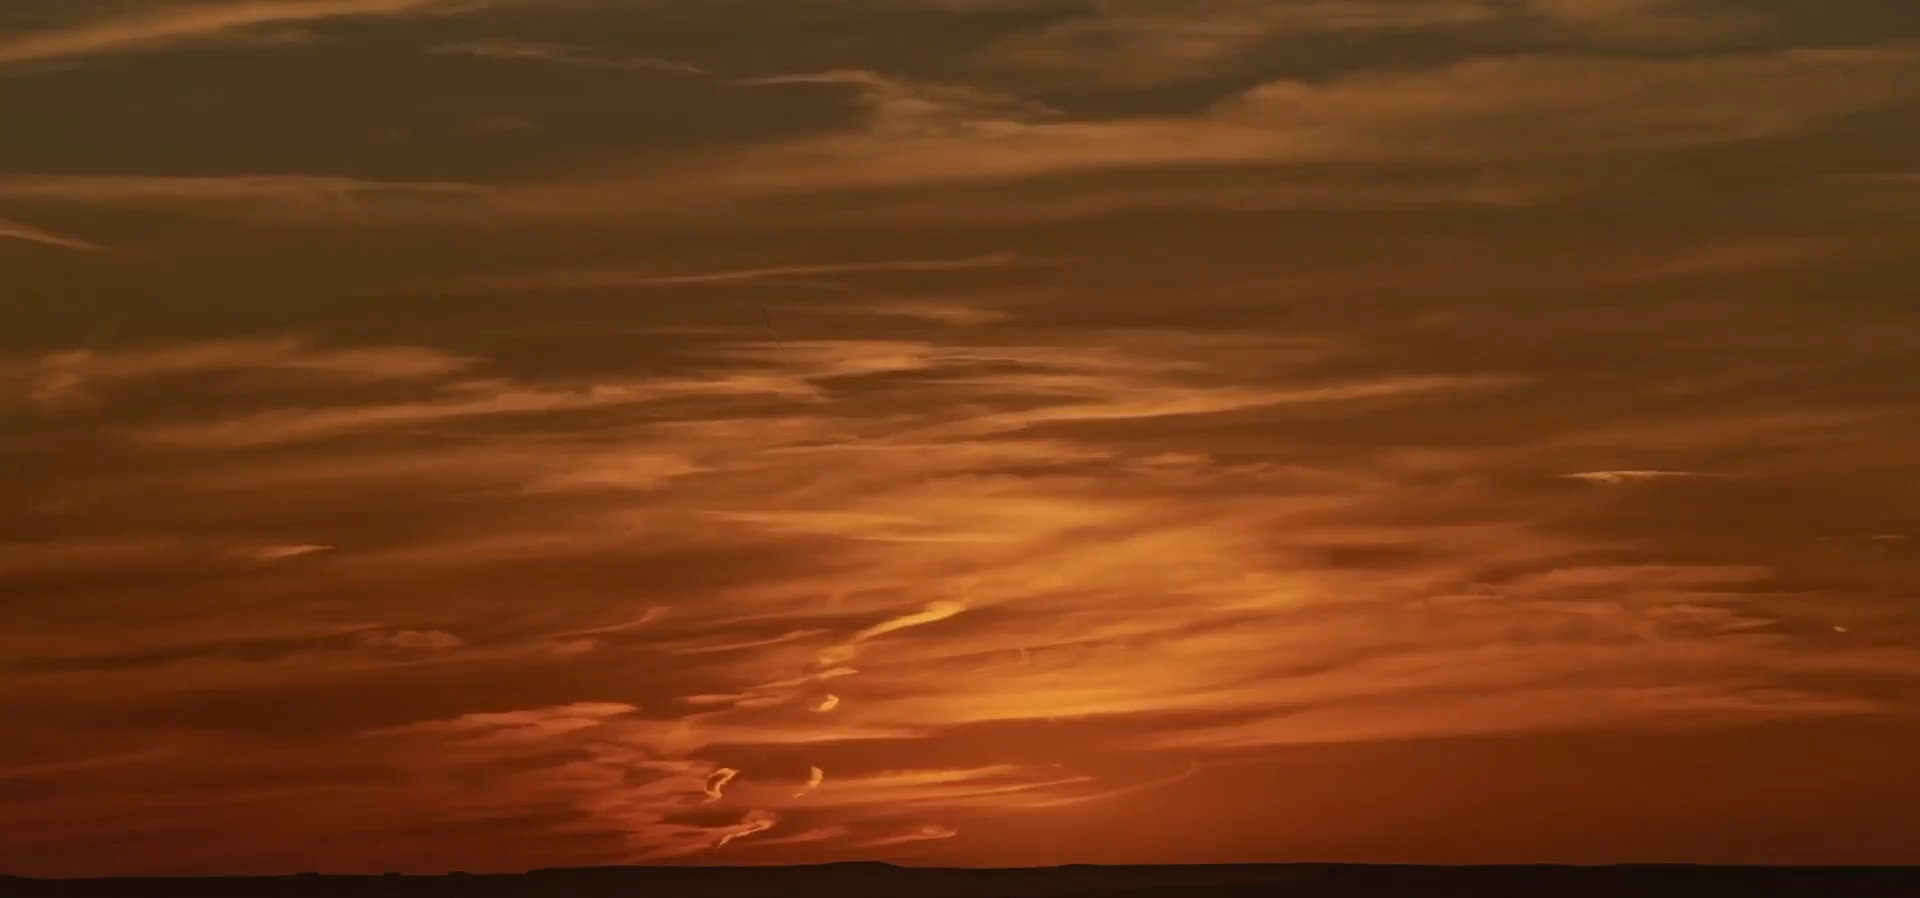 fire-sunset-sunrise-at-albuquerque-time-lapse